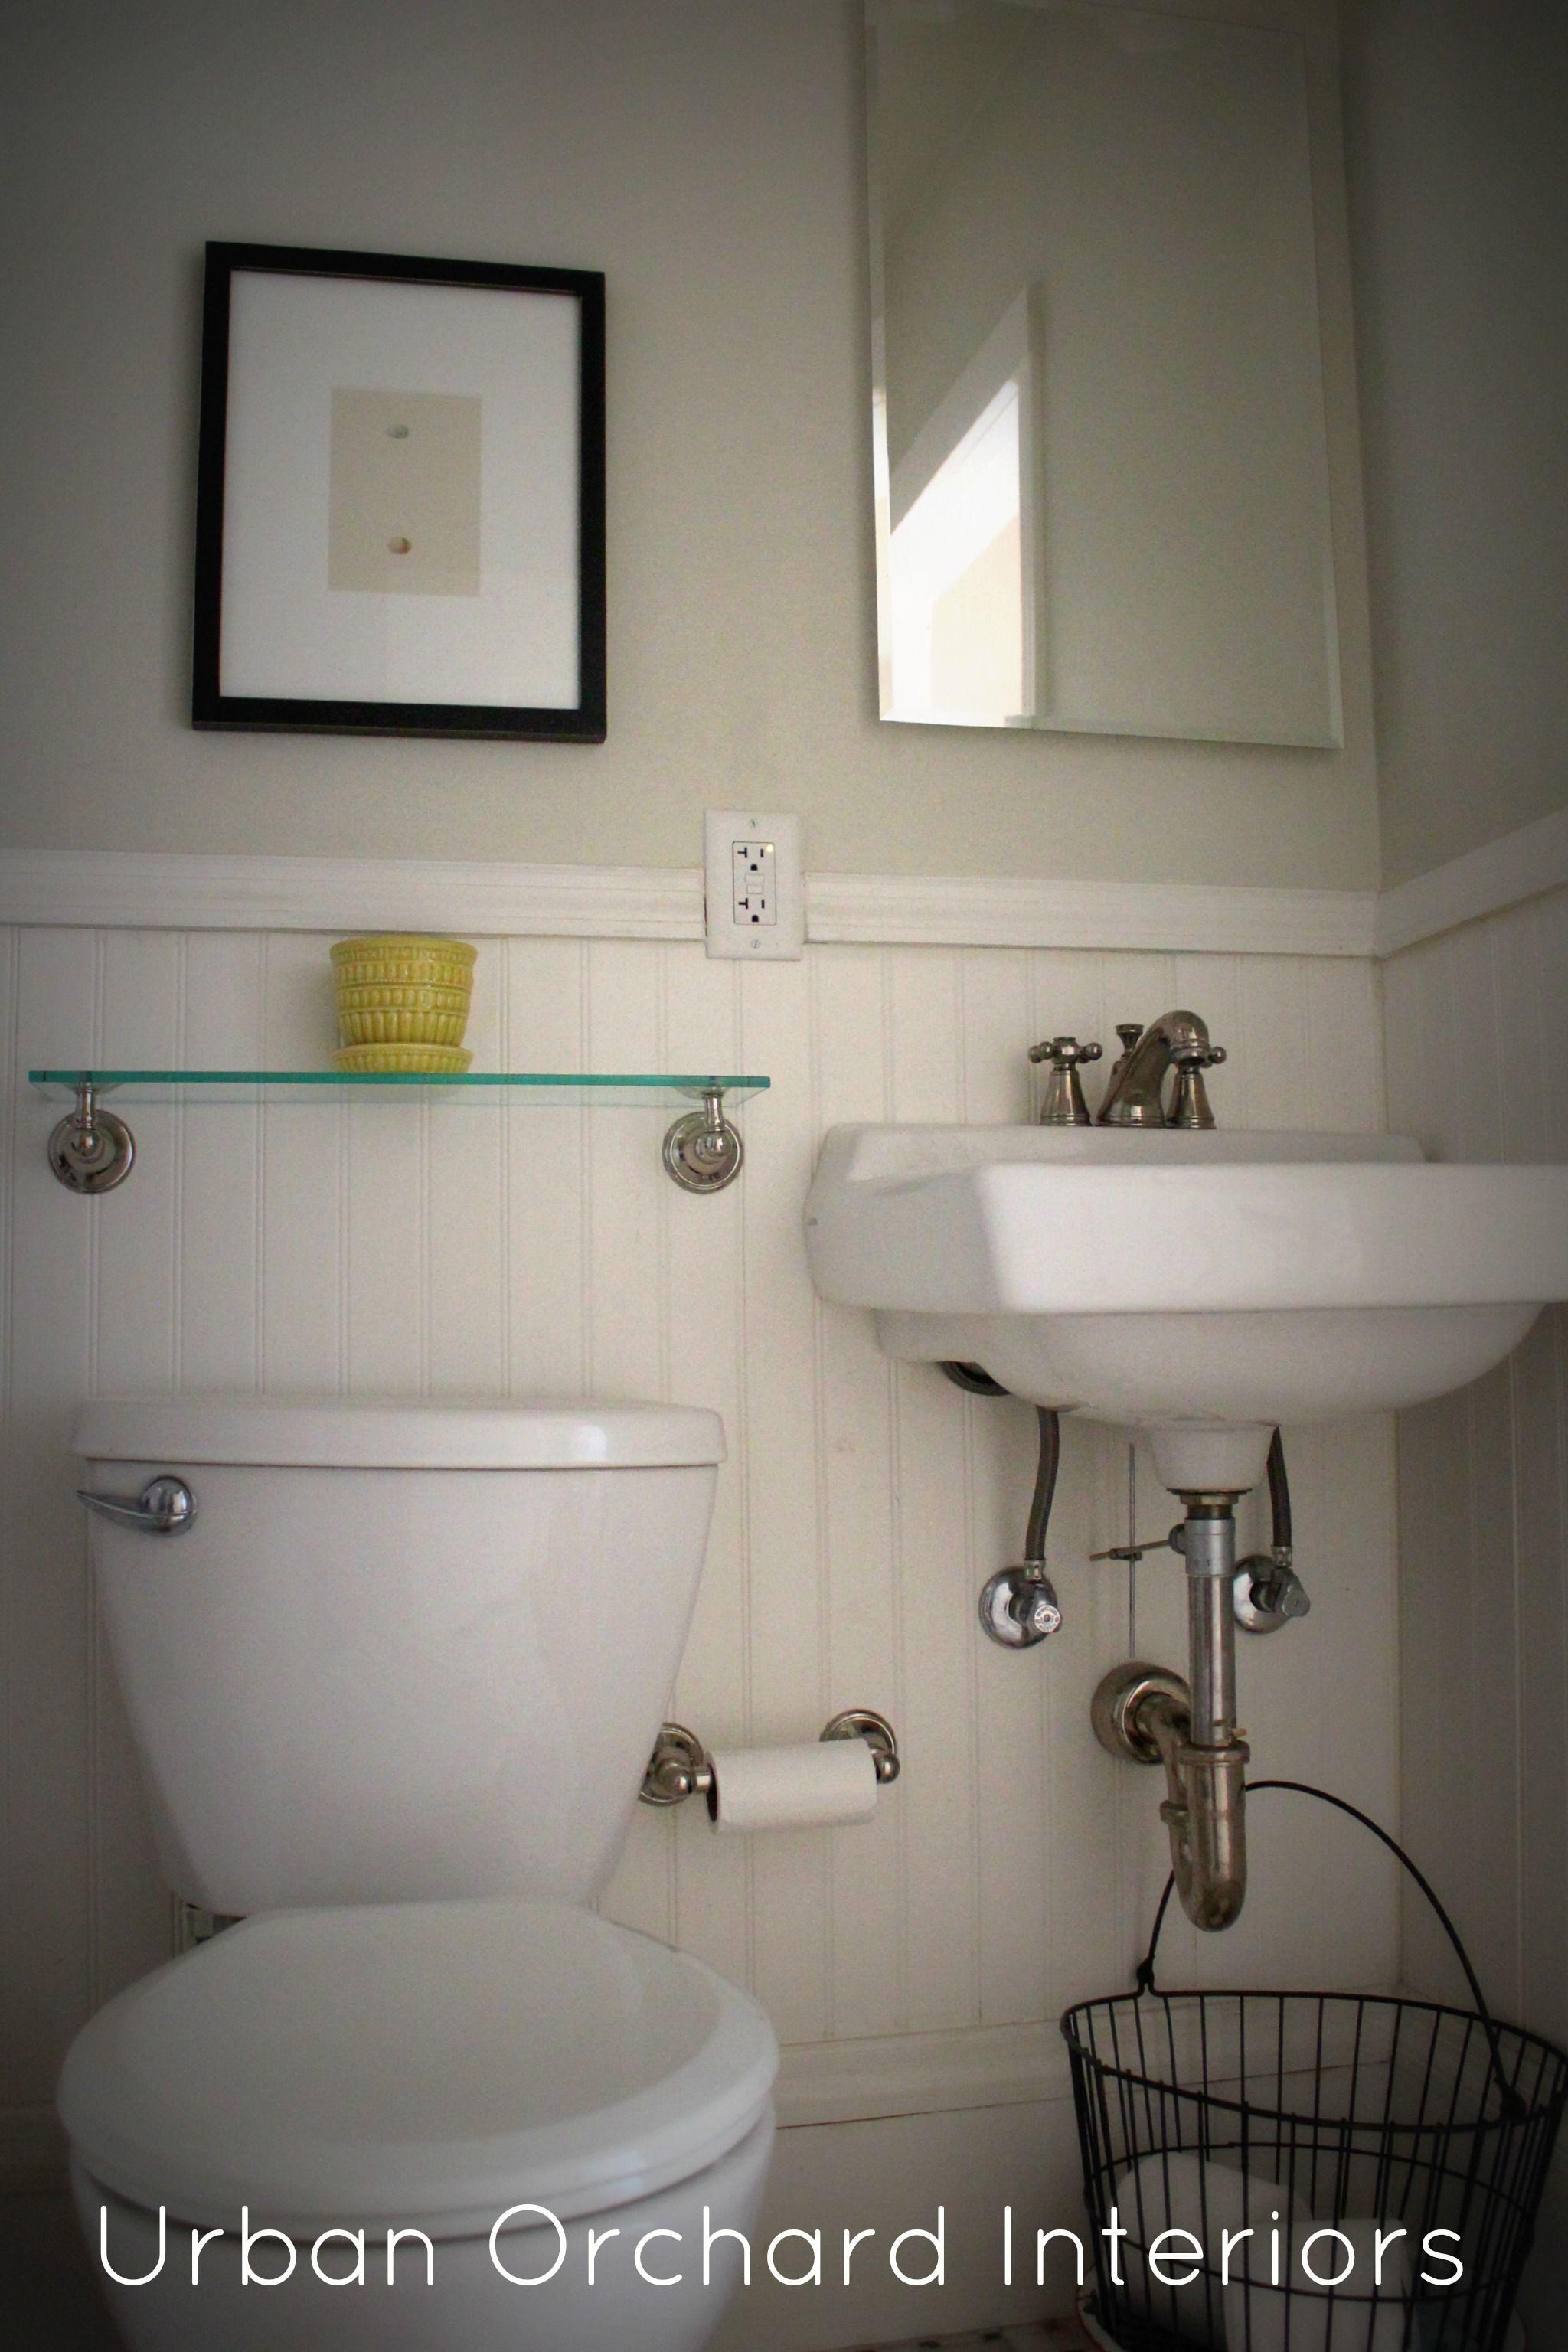 Kids Bathroom Gray Wall Paint Hanging Washbasin Stainless Steel Faucet Head Glasses Shelving Mirror Toilet Paper Holder Tissue Ceramic Flooring Tile A